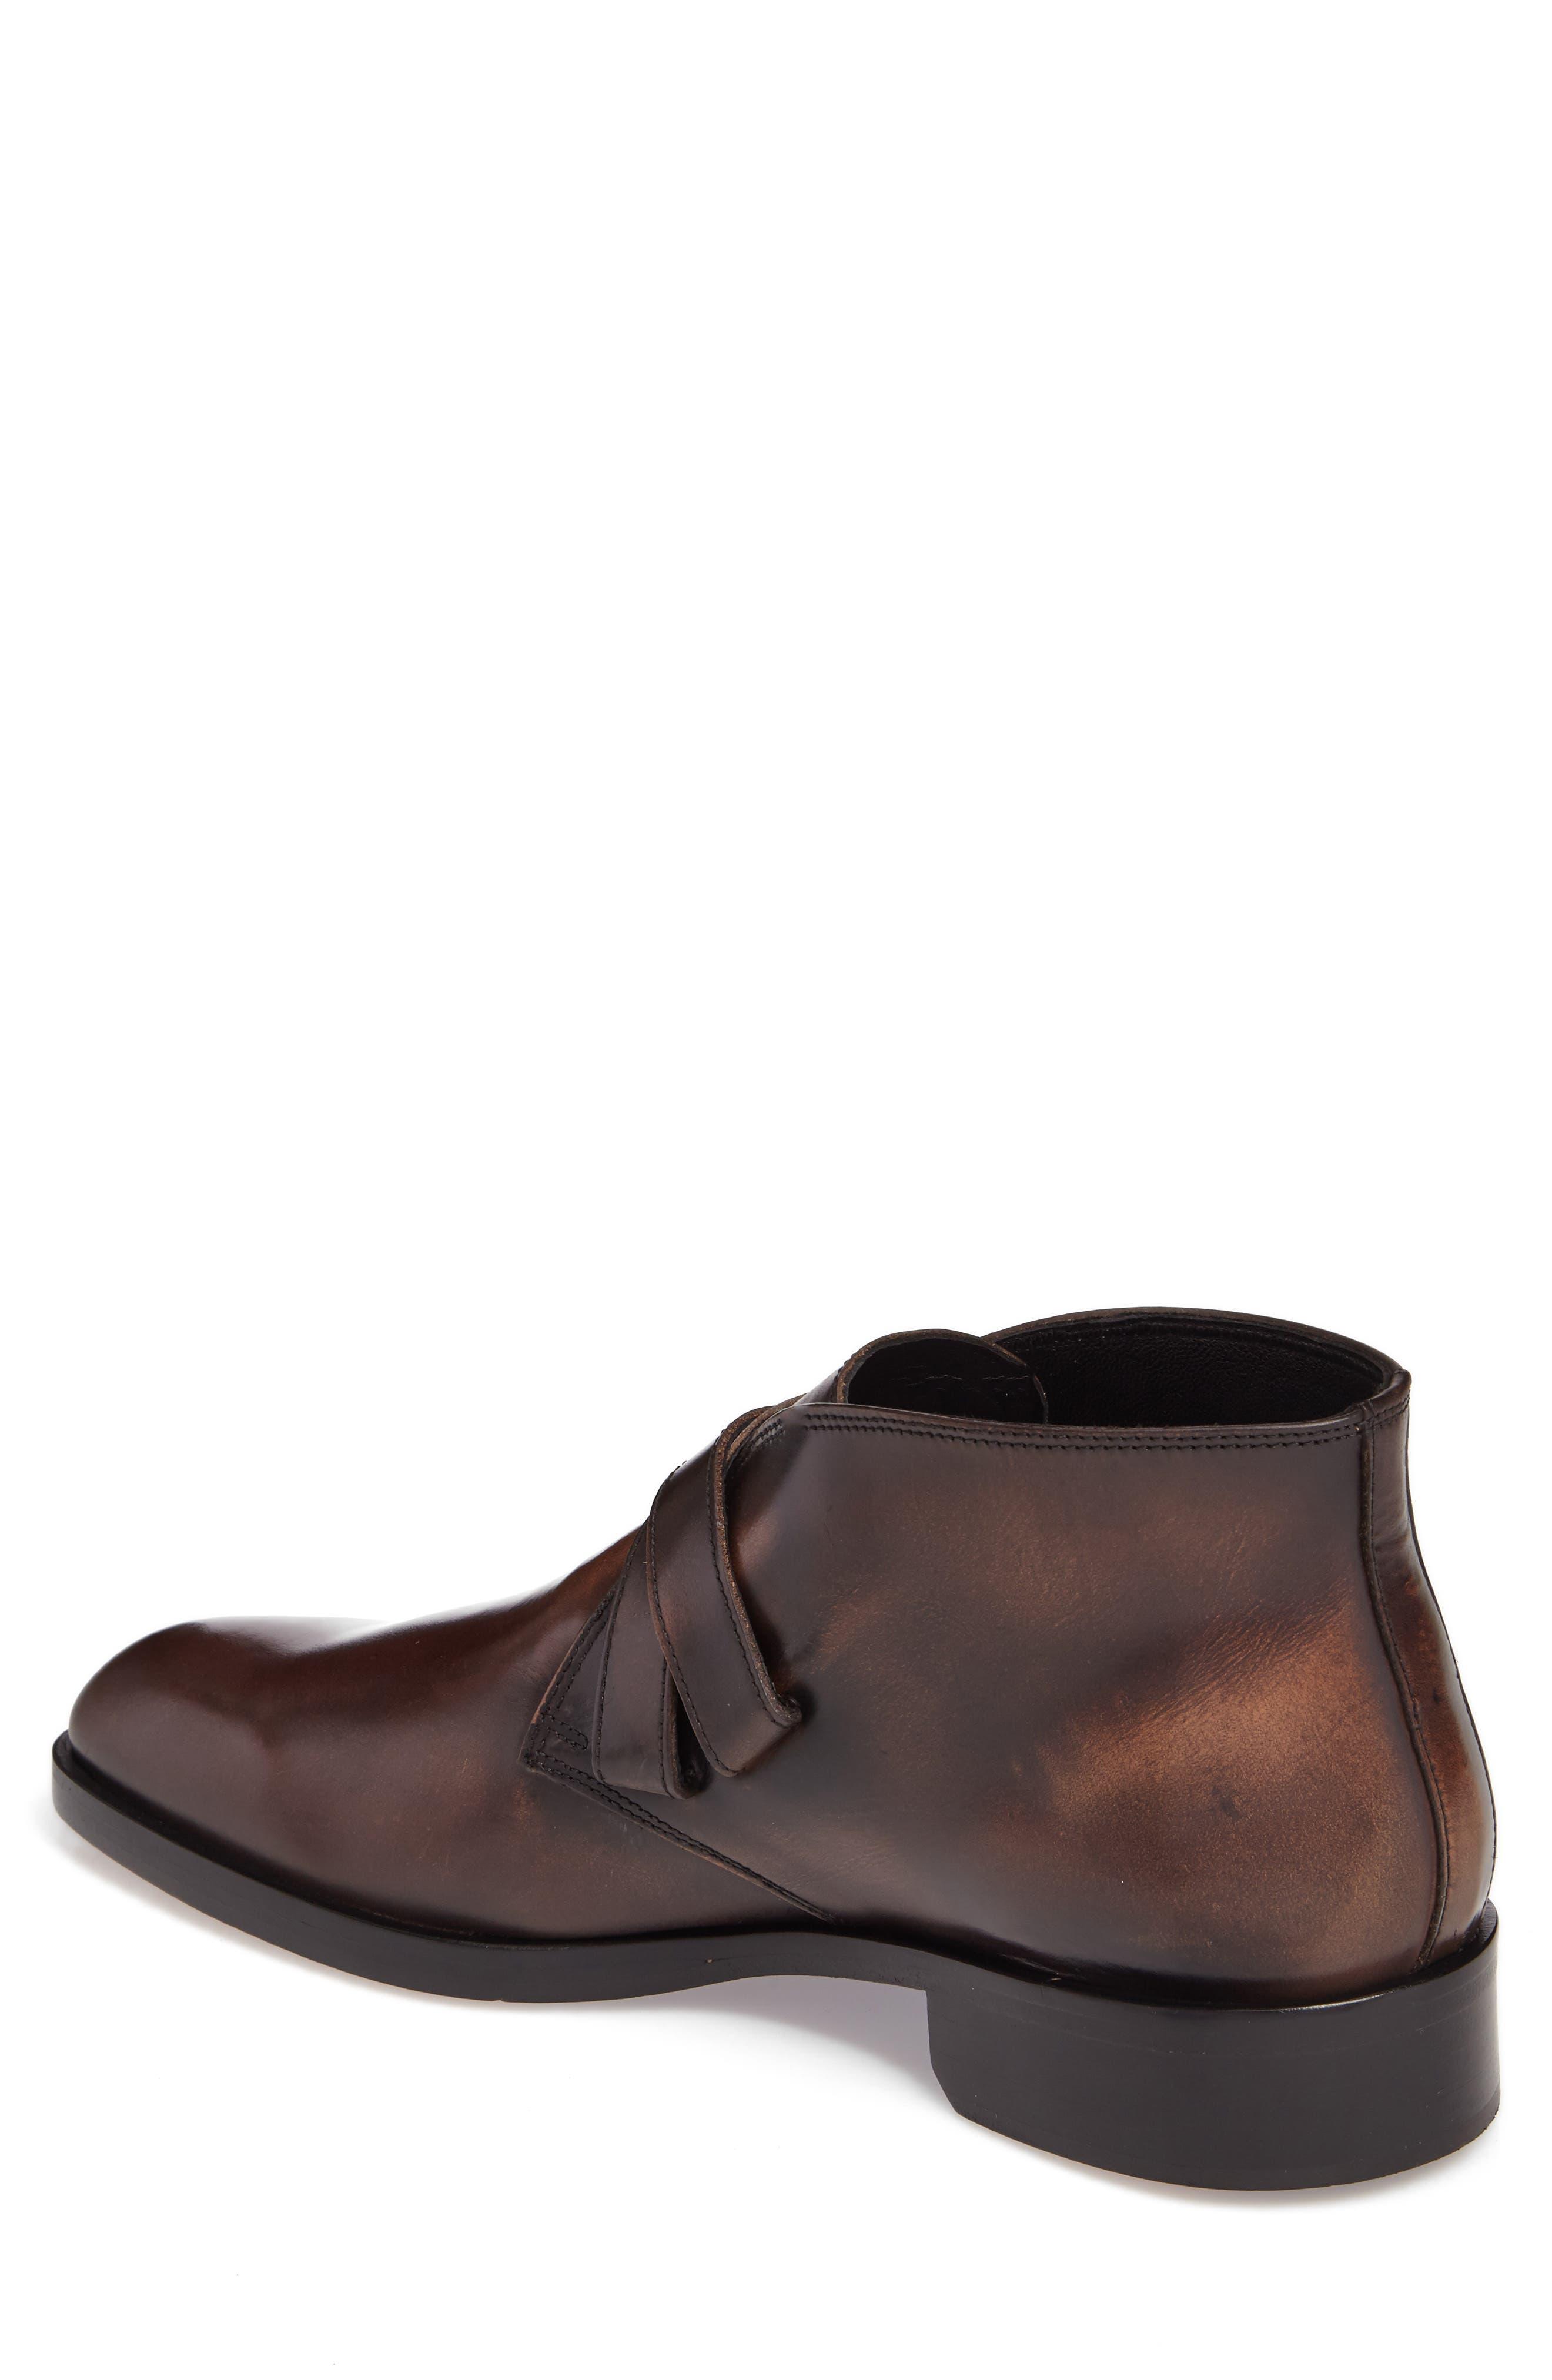 Donald J Pliner Zigor Double Monk Strap Boot,                             Alternate thumbnail 2, color,                             200